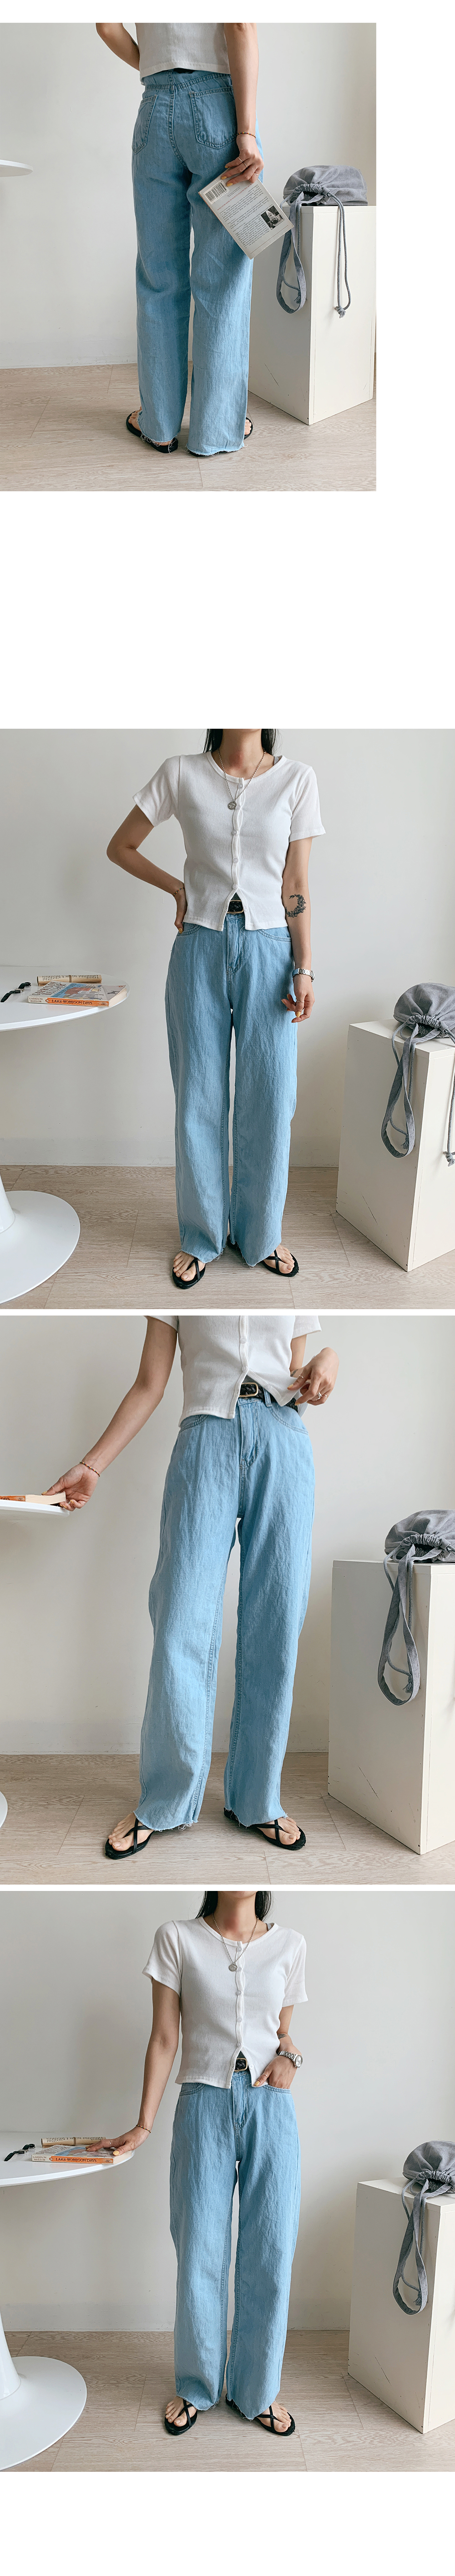 Ment summer cool denim wide pants